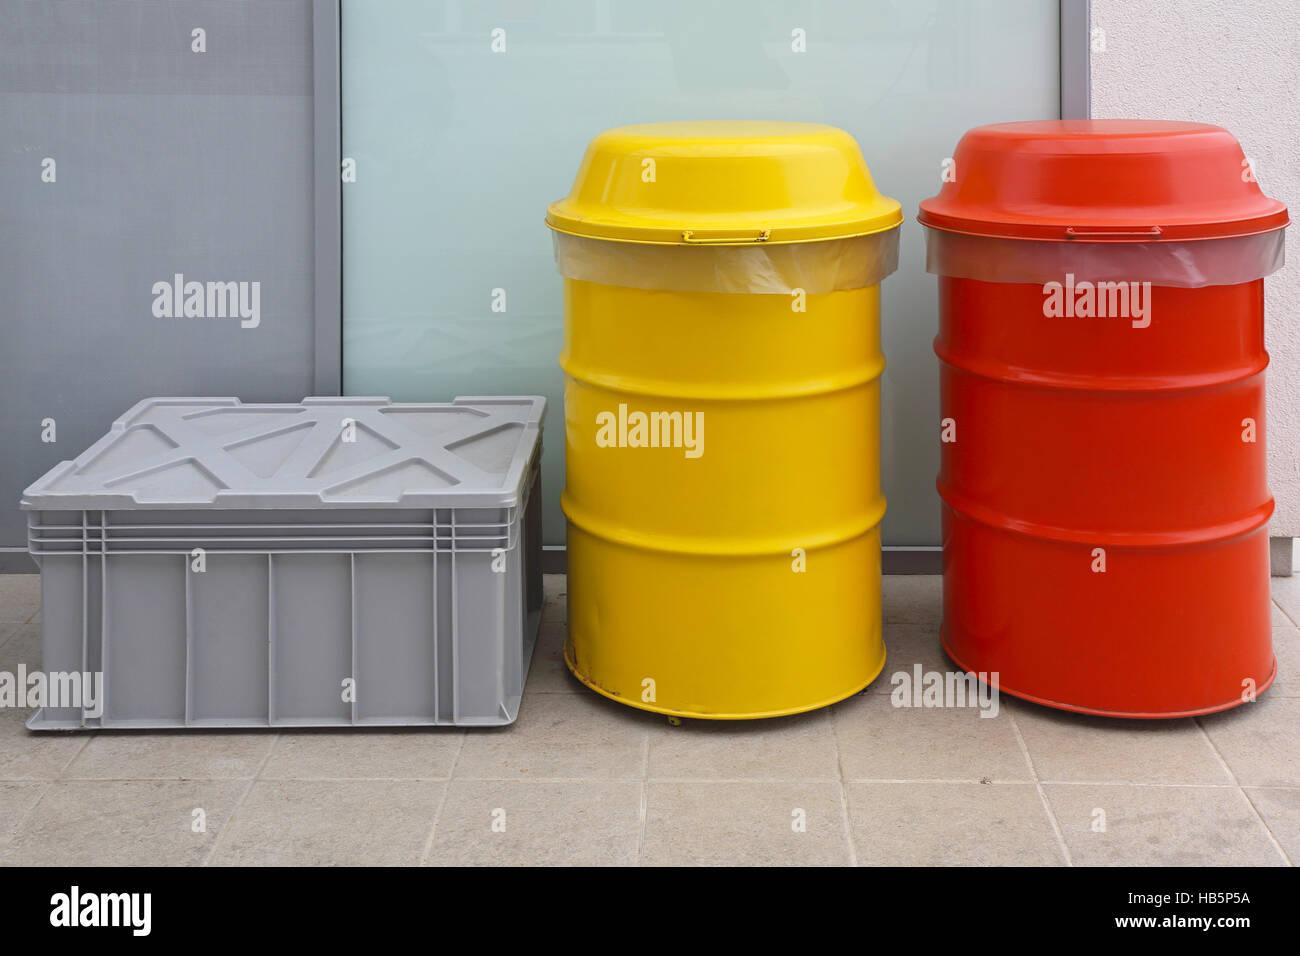 Hazardous Waste Disposal Barrels - Stock Image